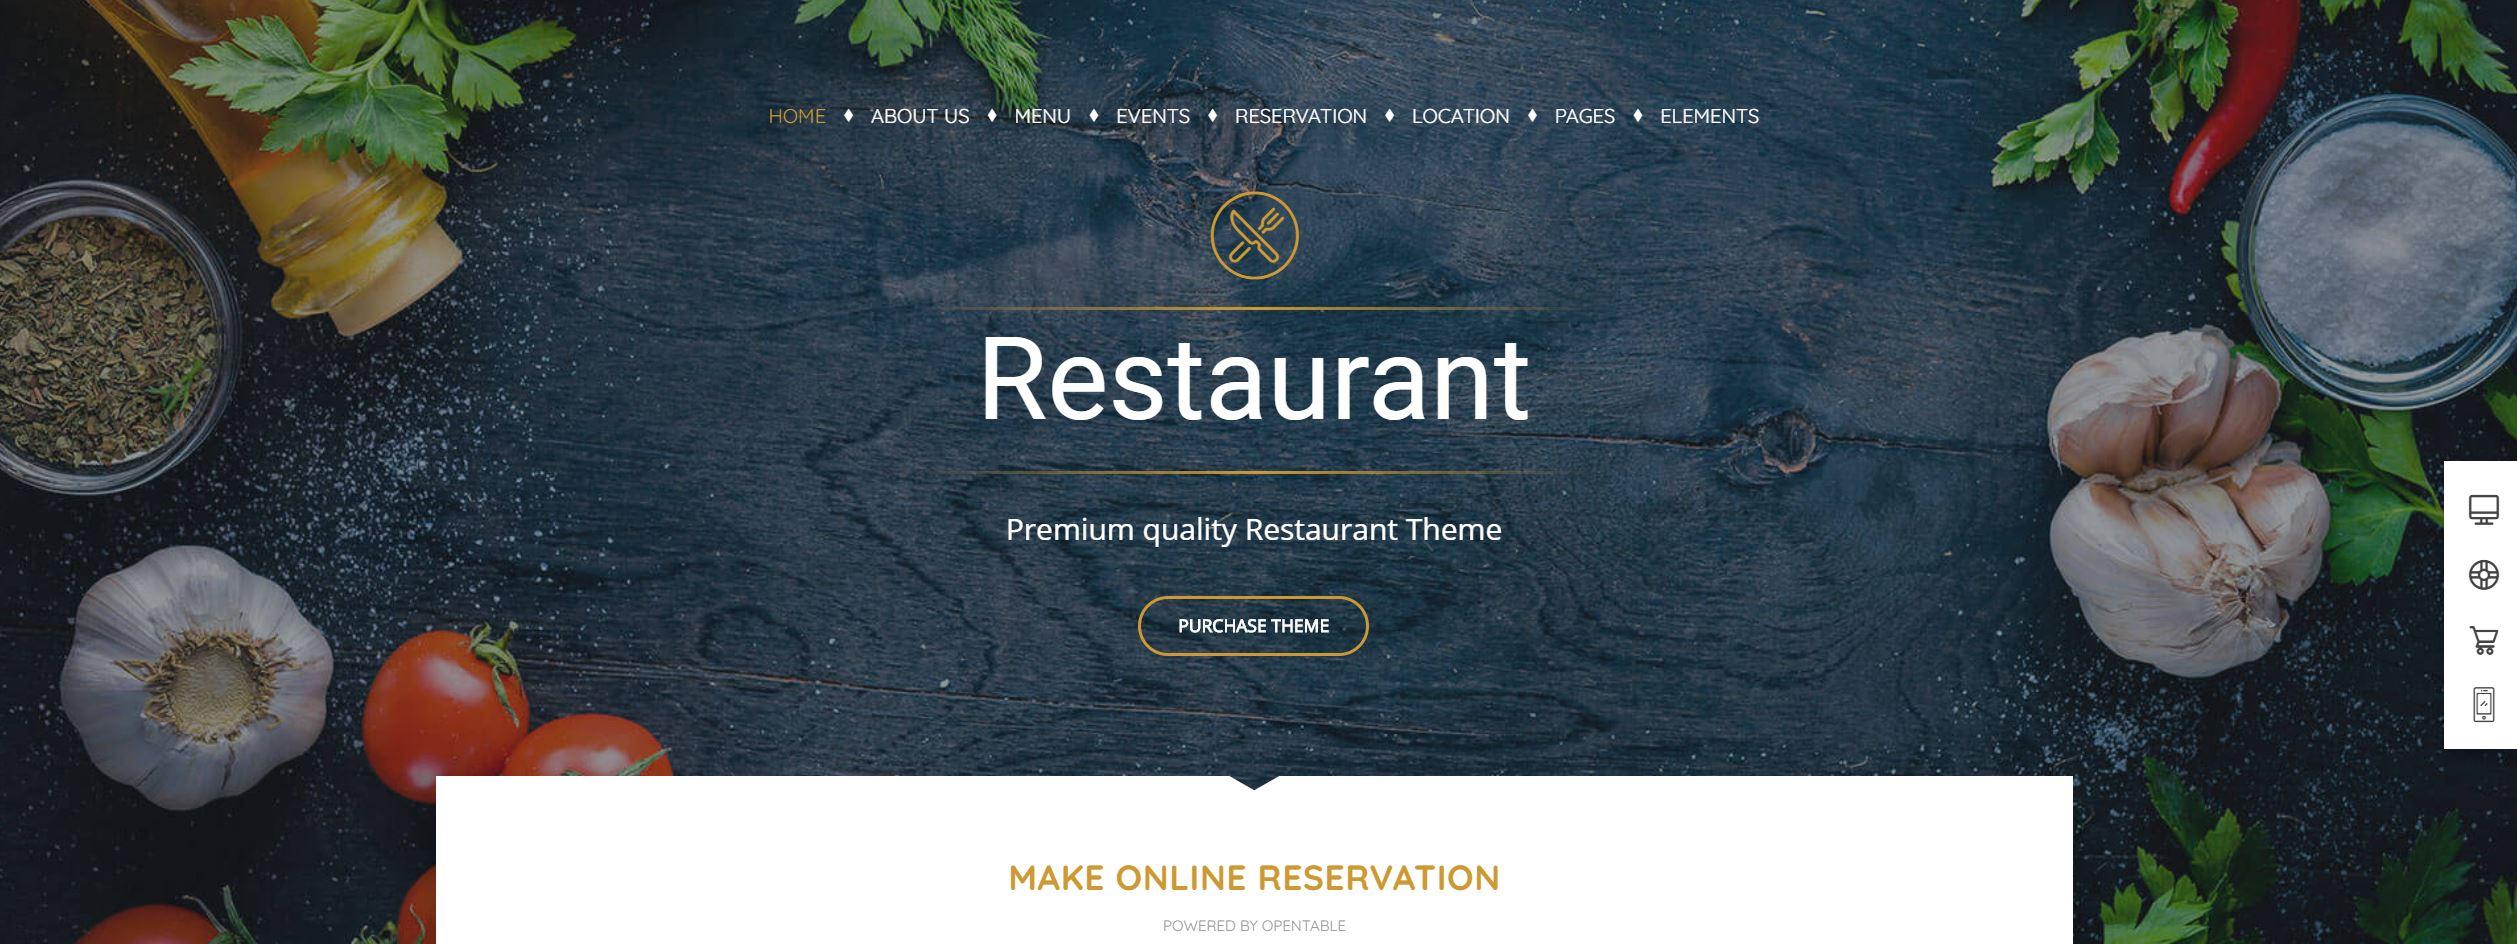 Restaurant-theme-wordpress